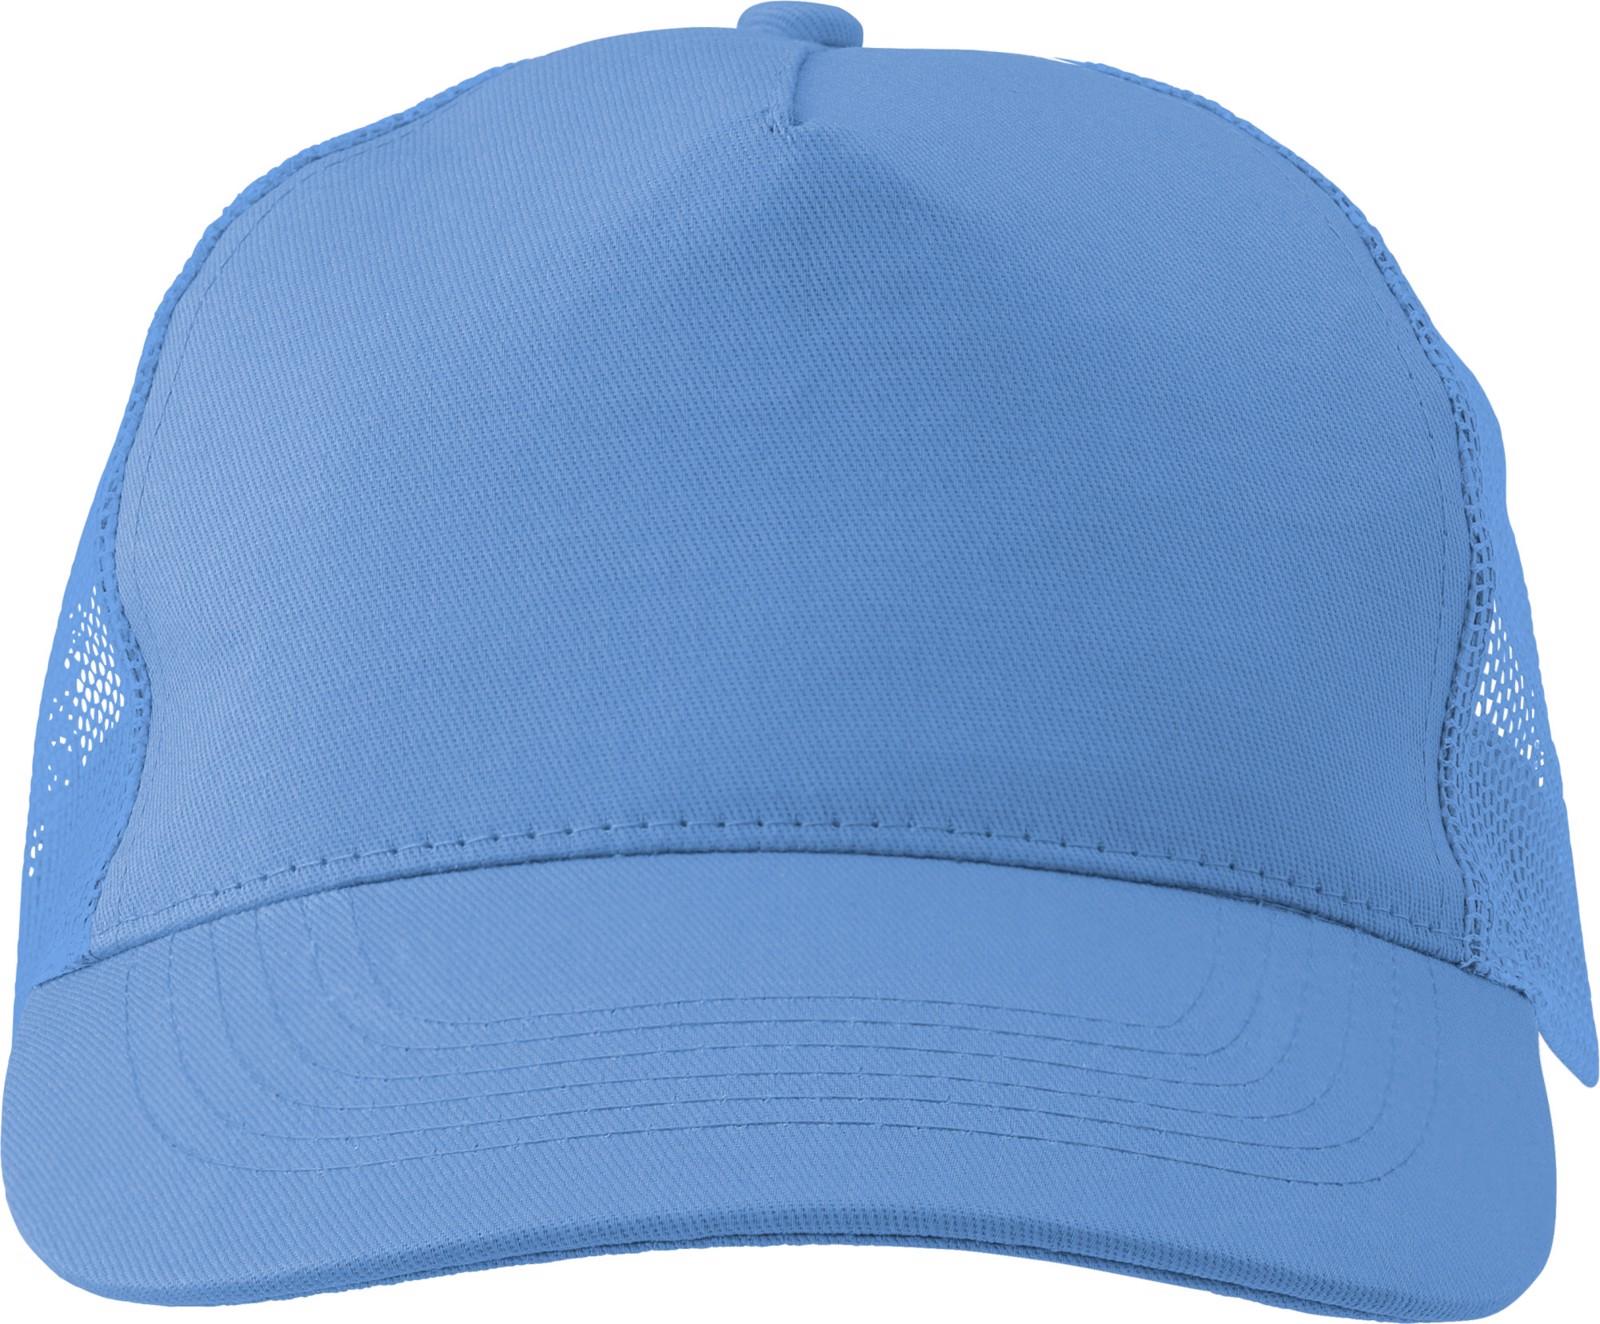 Cotton twill and plastic cap - Light Blue